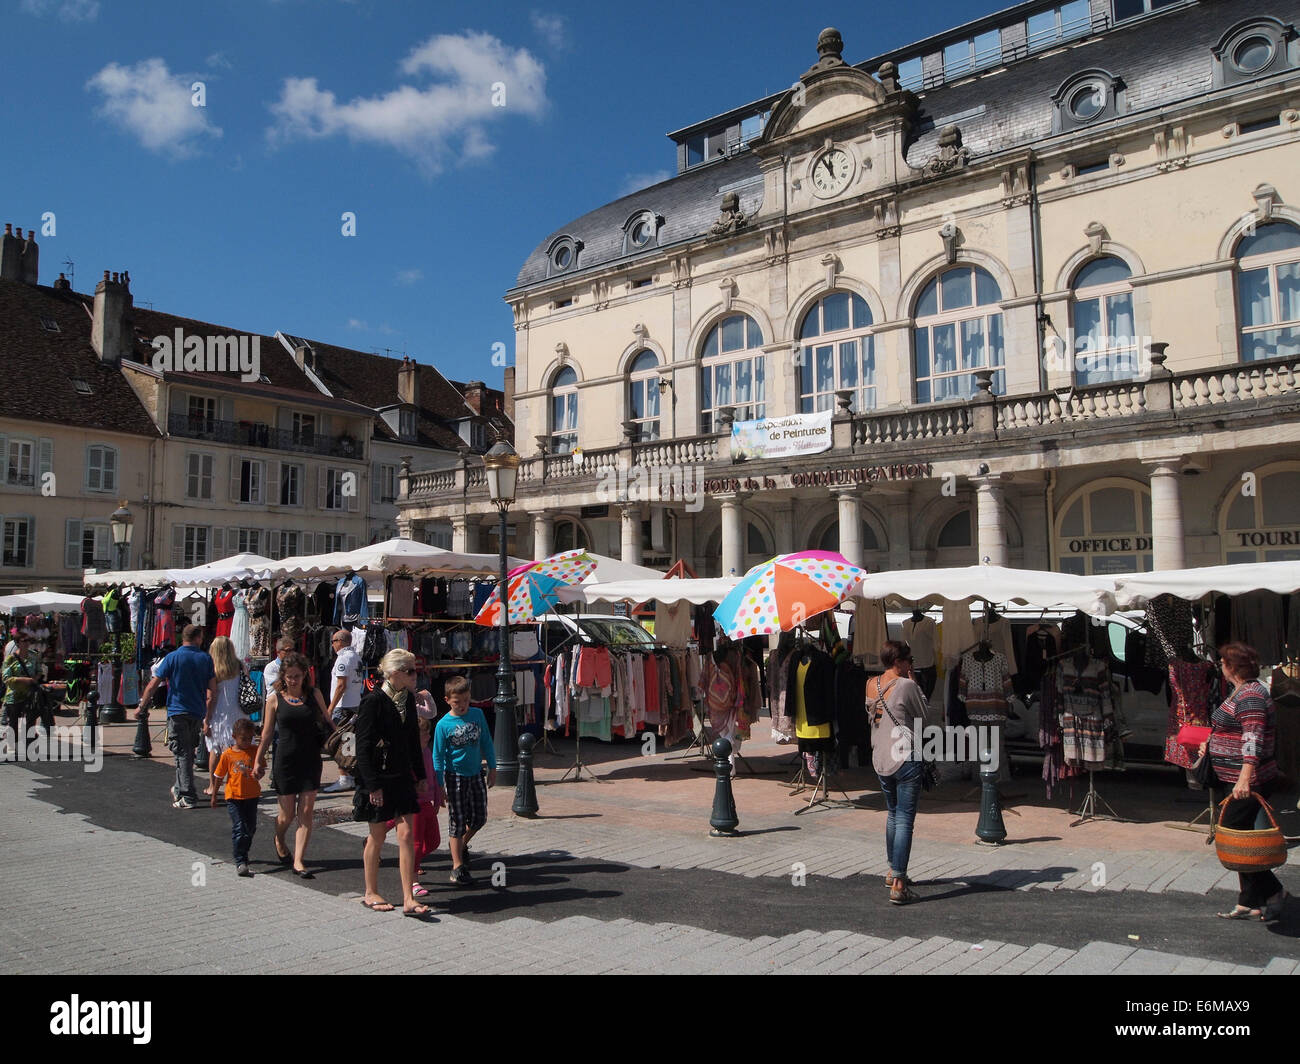 Market in Lons le Saunier, Jura, France - Stock Image